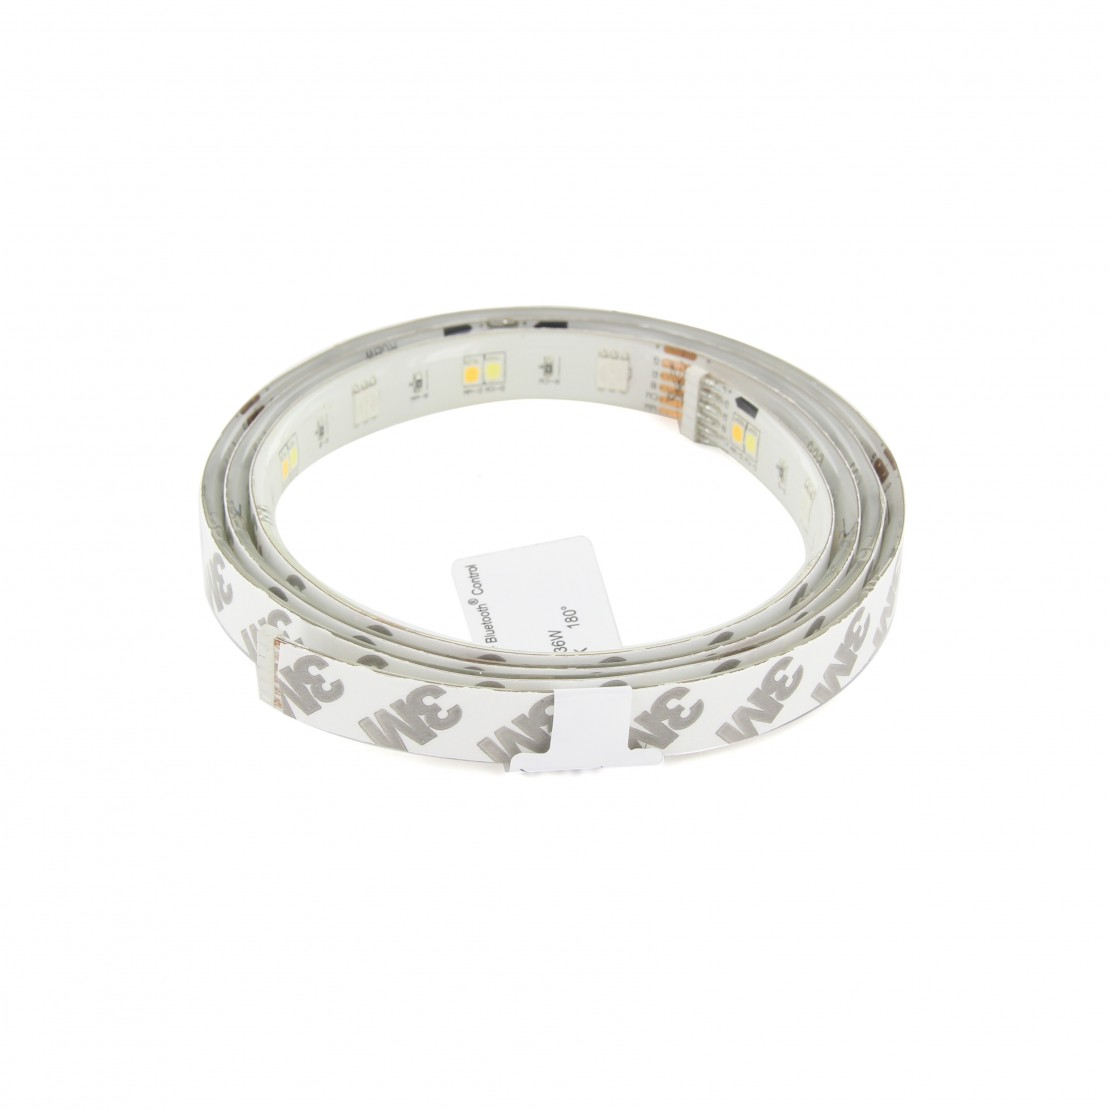 StripLED - extension ruban lumineux LED Bluetooth